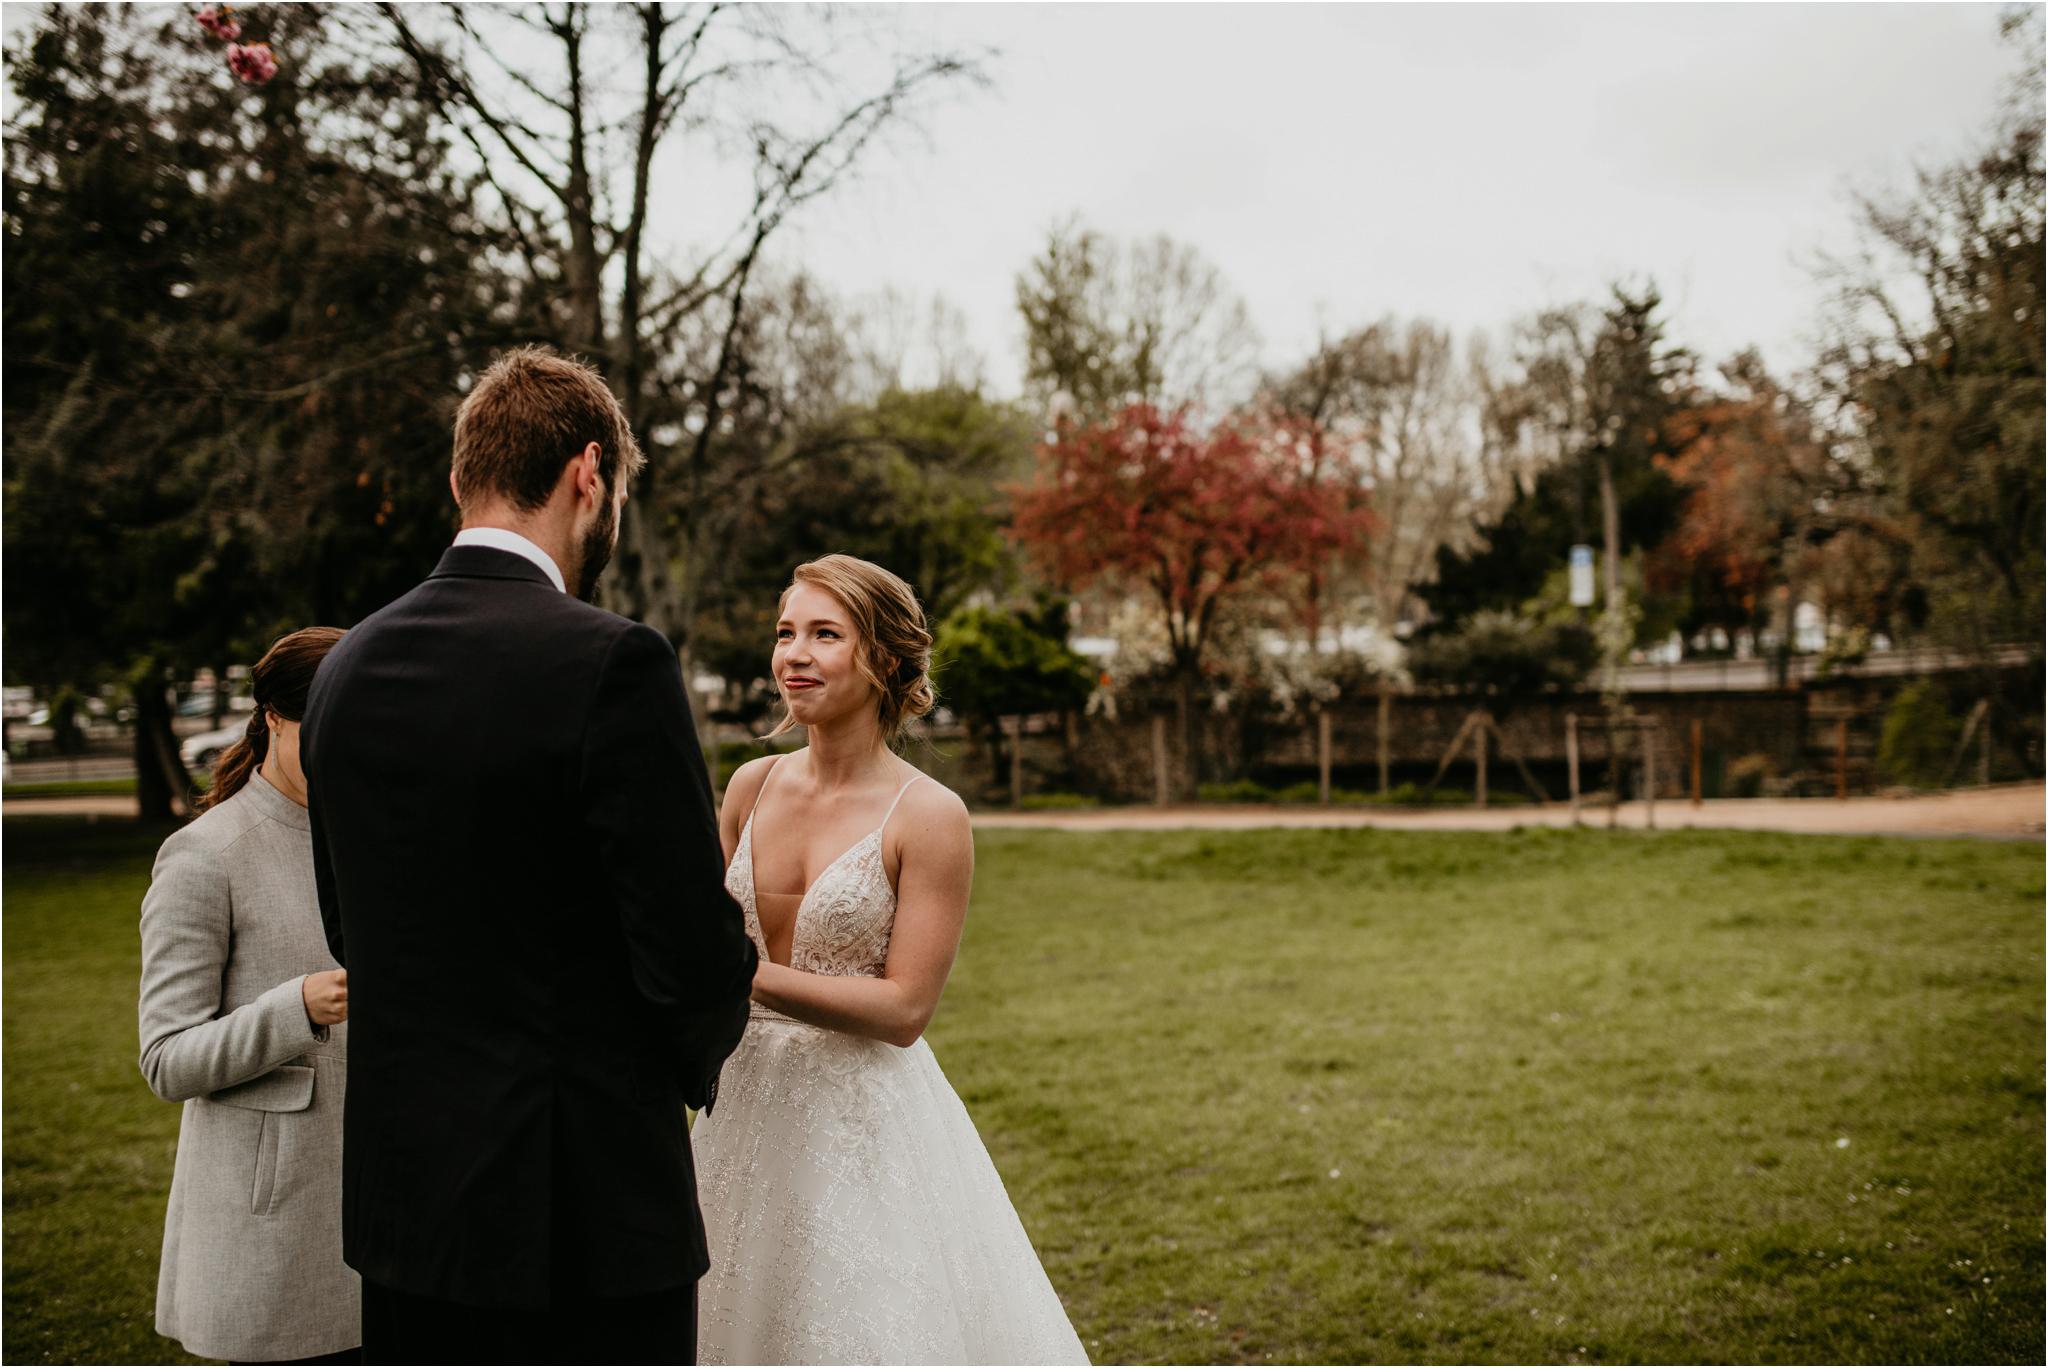 miranda-and-jared-paris-elopement-destination-wedding-photographer-030.jpg